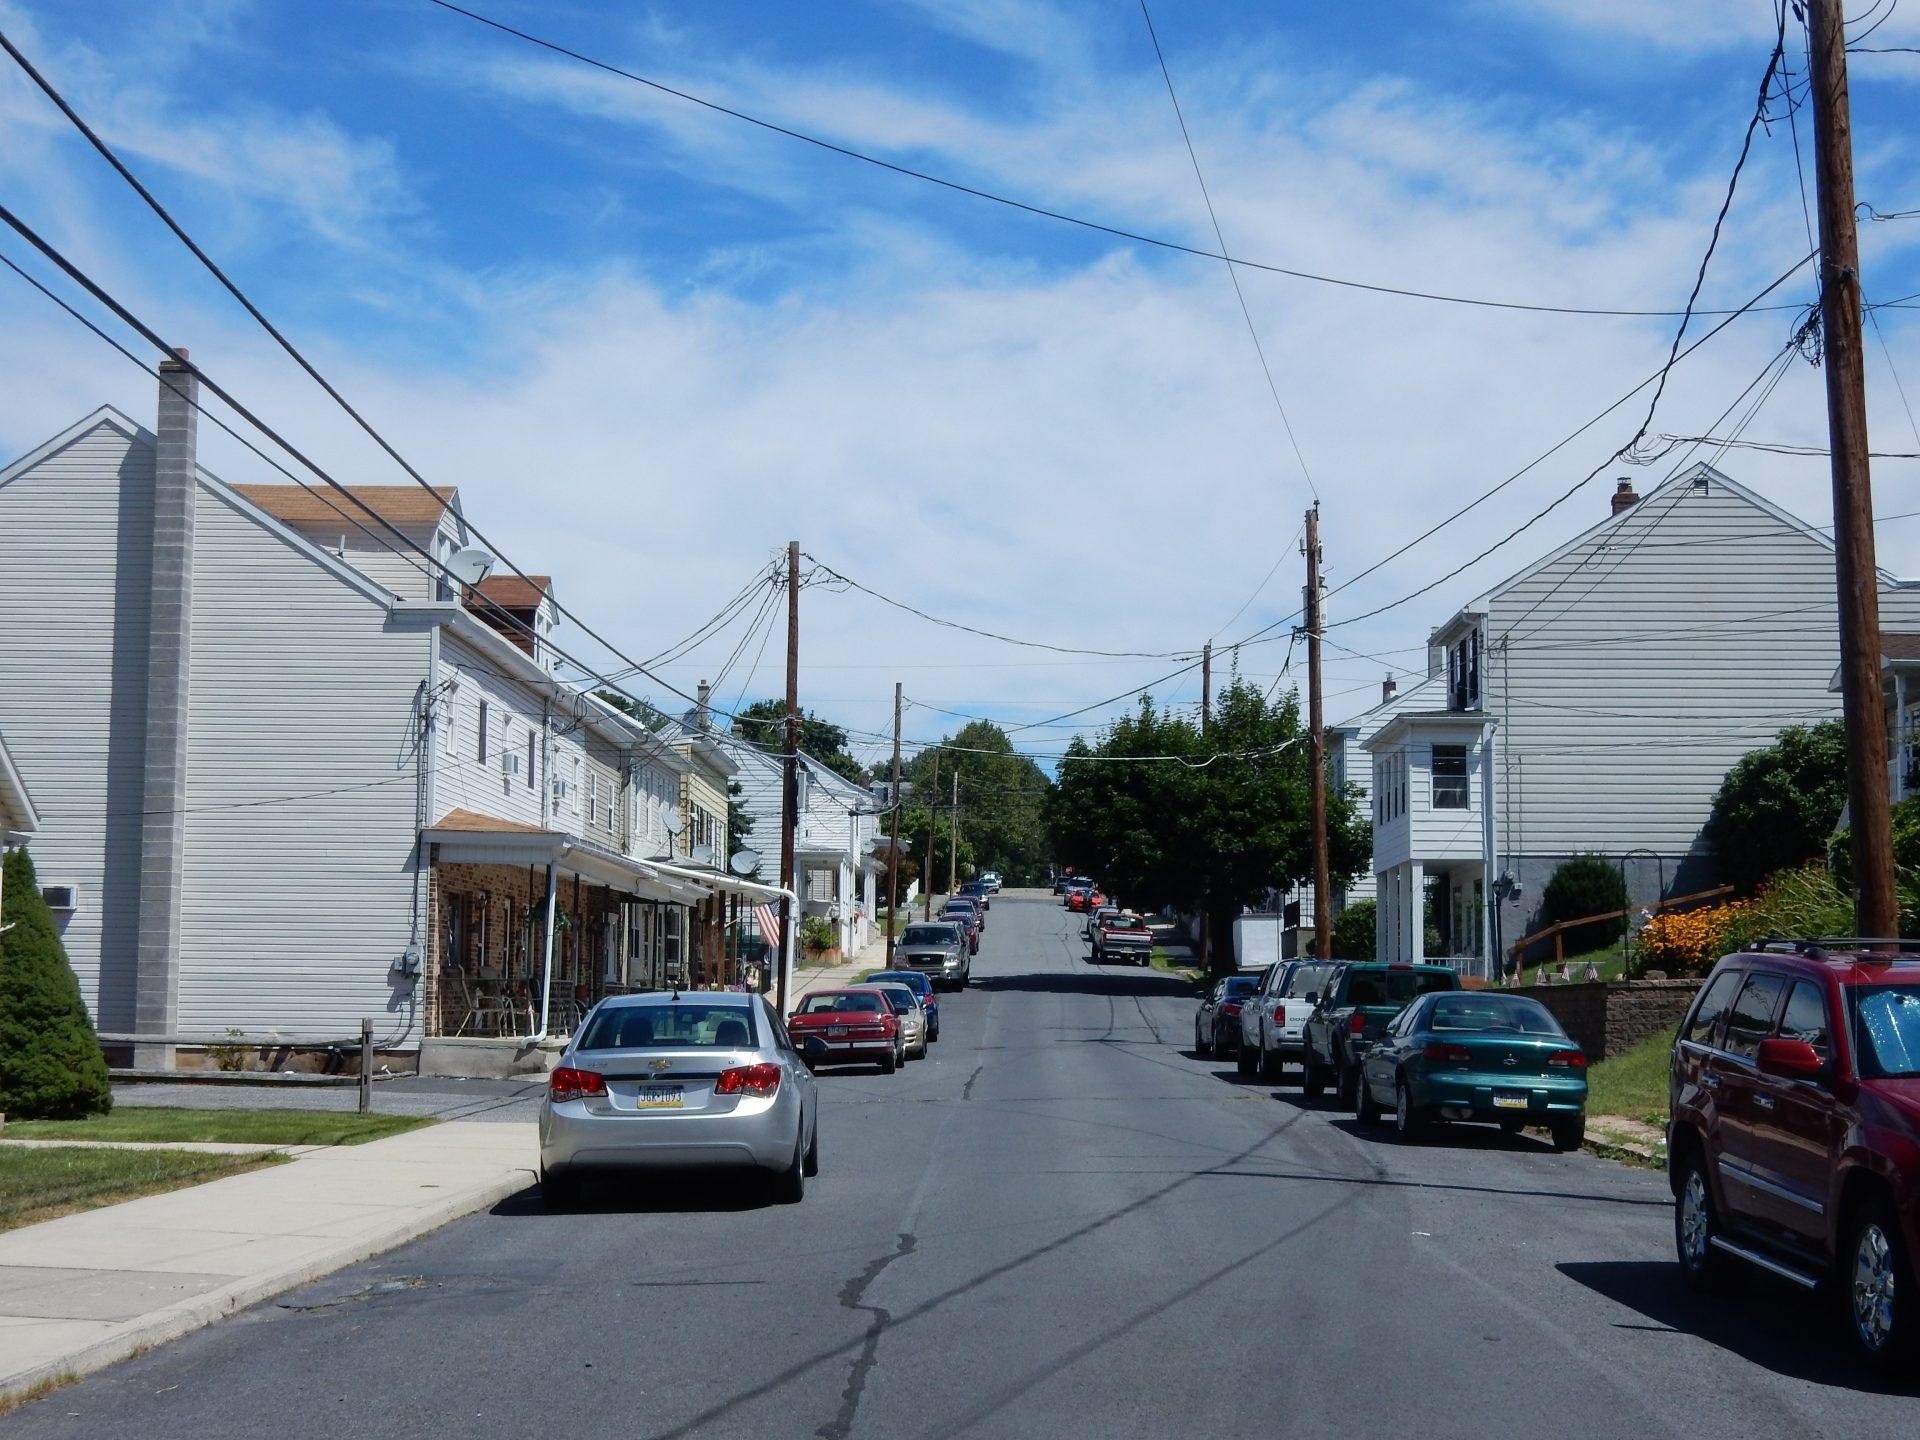 Main St., Seltzer, Norwegian Township, Schuylkill County, Pennsylvania. Looking west.